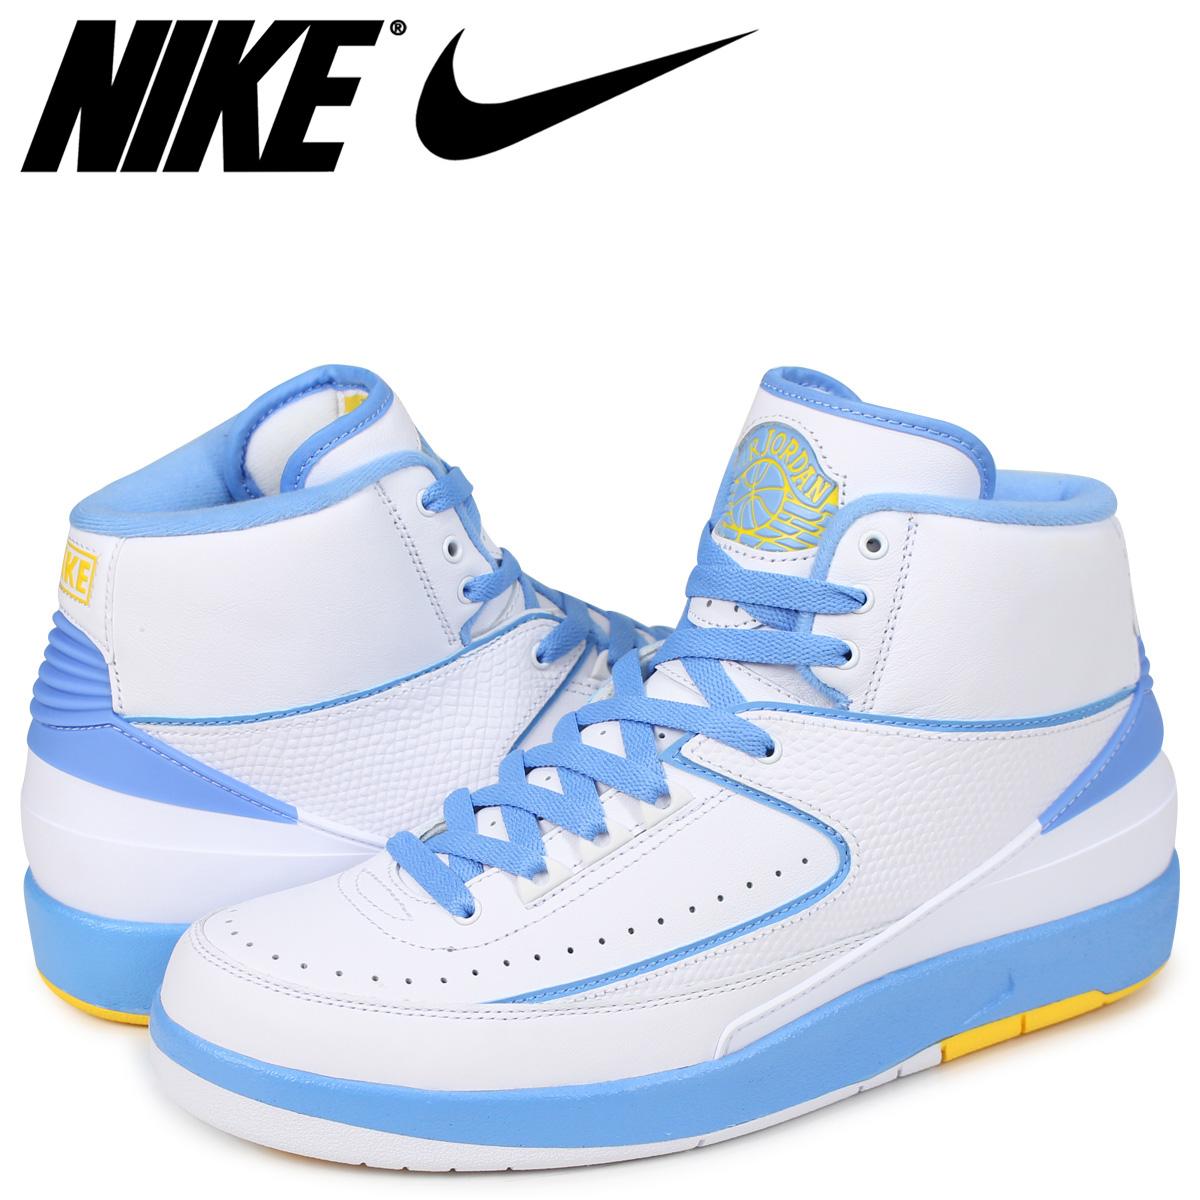 0d7badee0a68 NIKE AIR JORDAN 2 RETRO MELO Nike Air Jordan 2 sneakers nostalgic men white  385